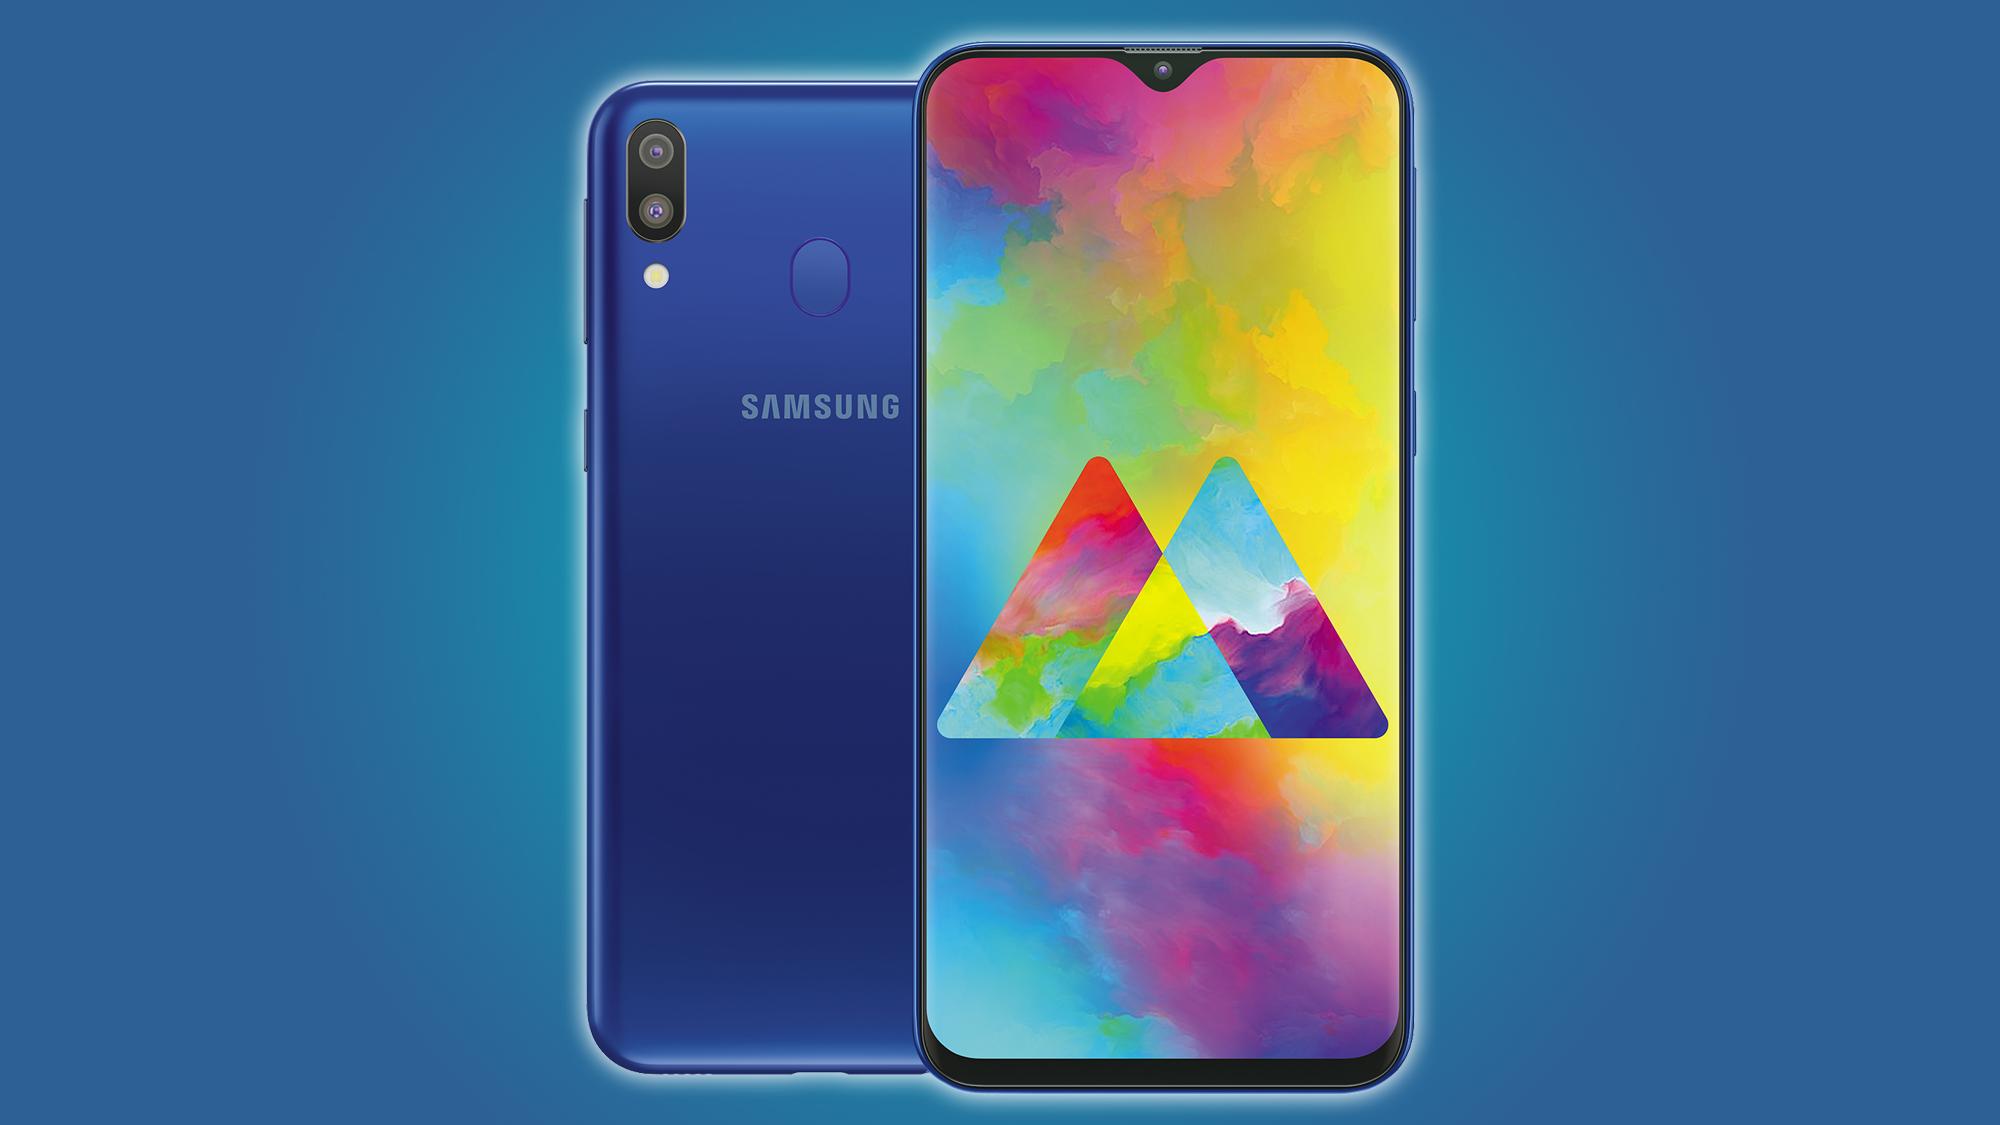 Samsung's Galaxy M20 smartphone